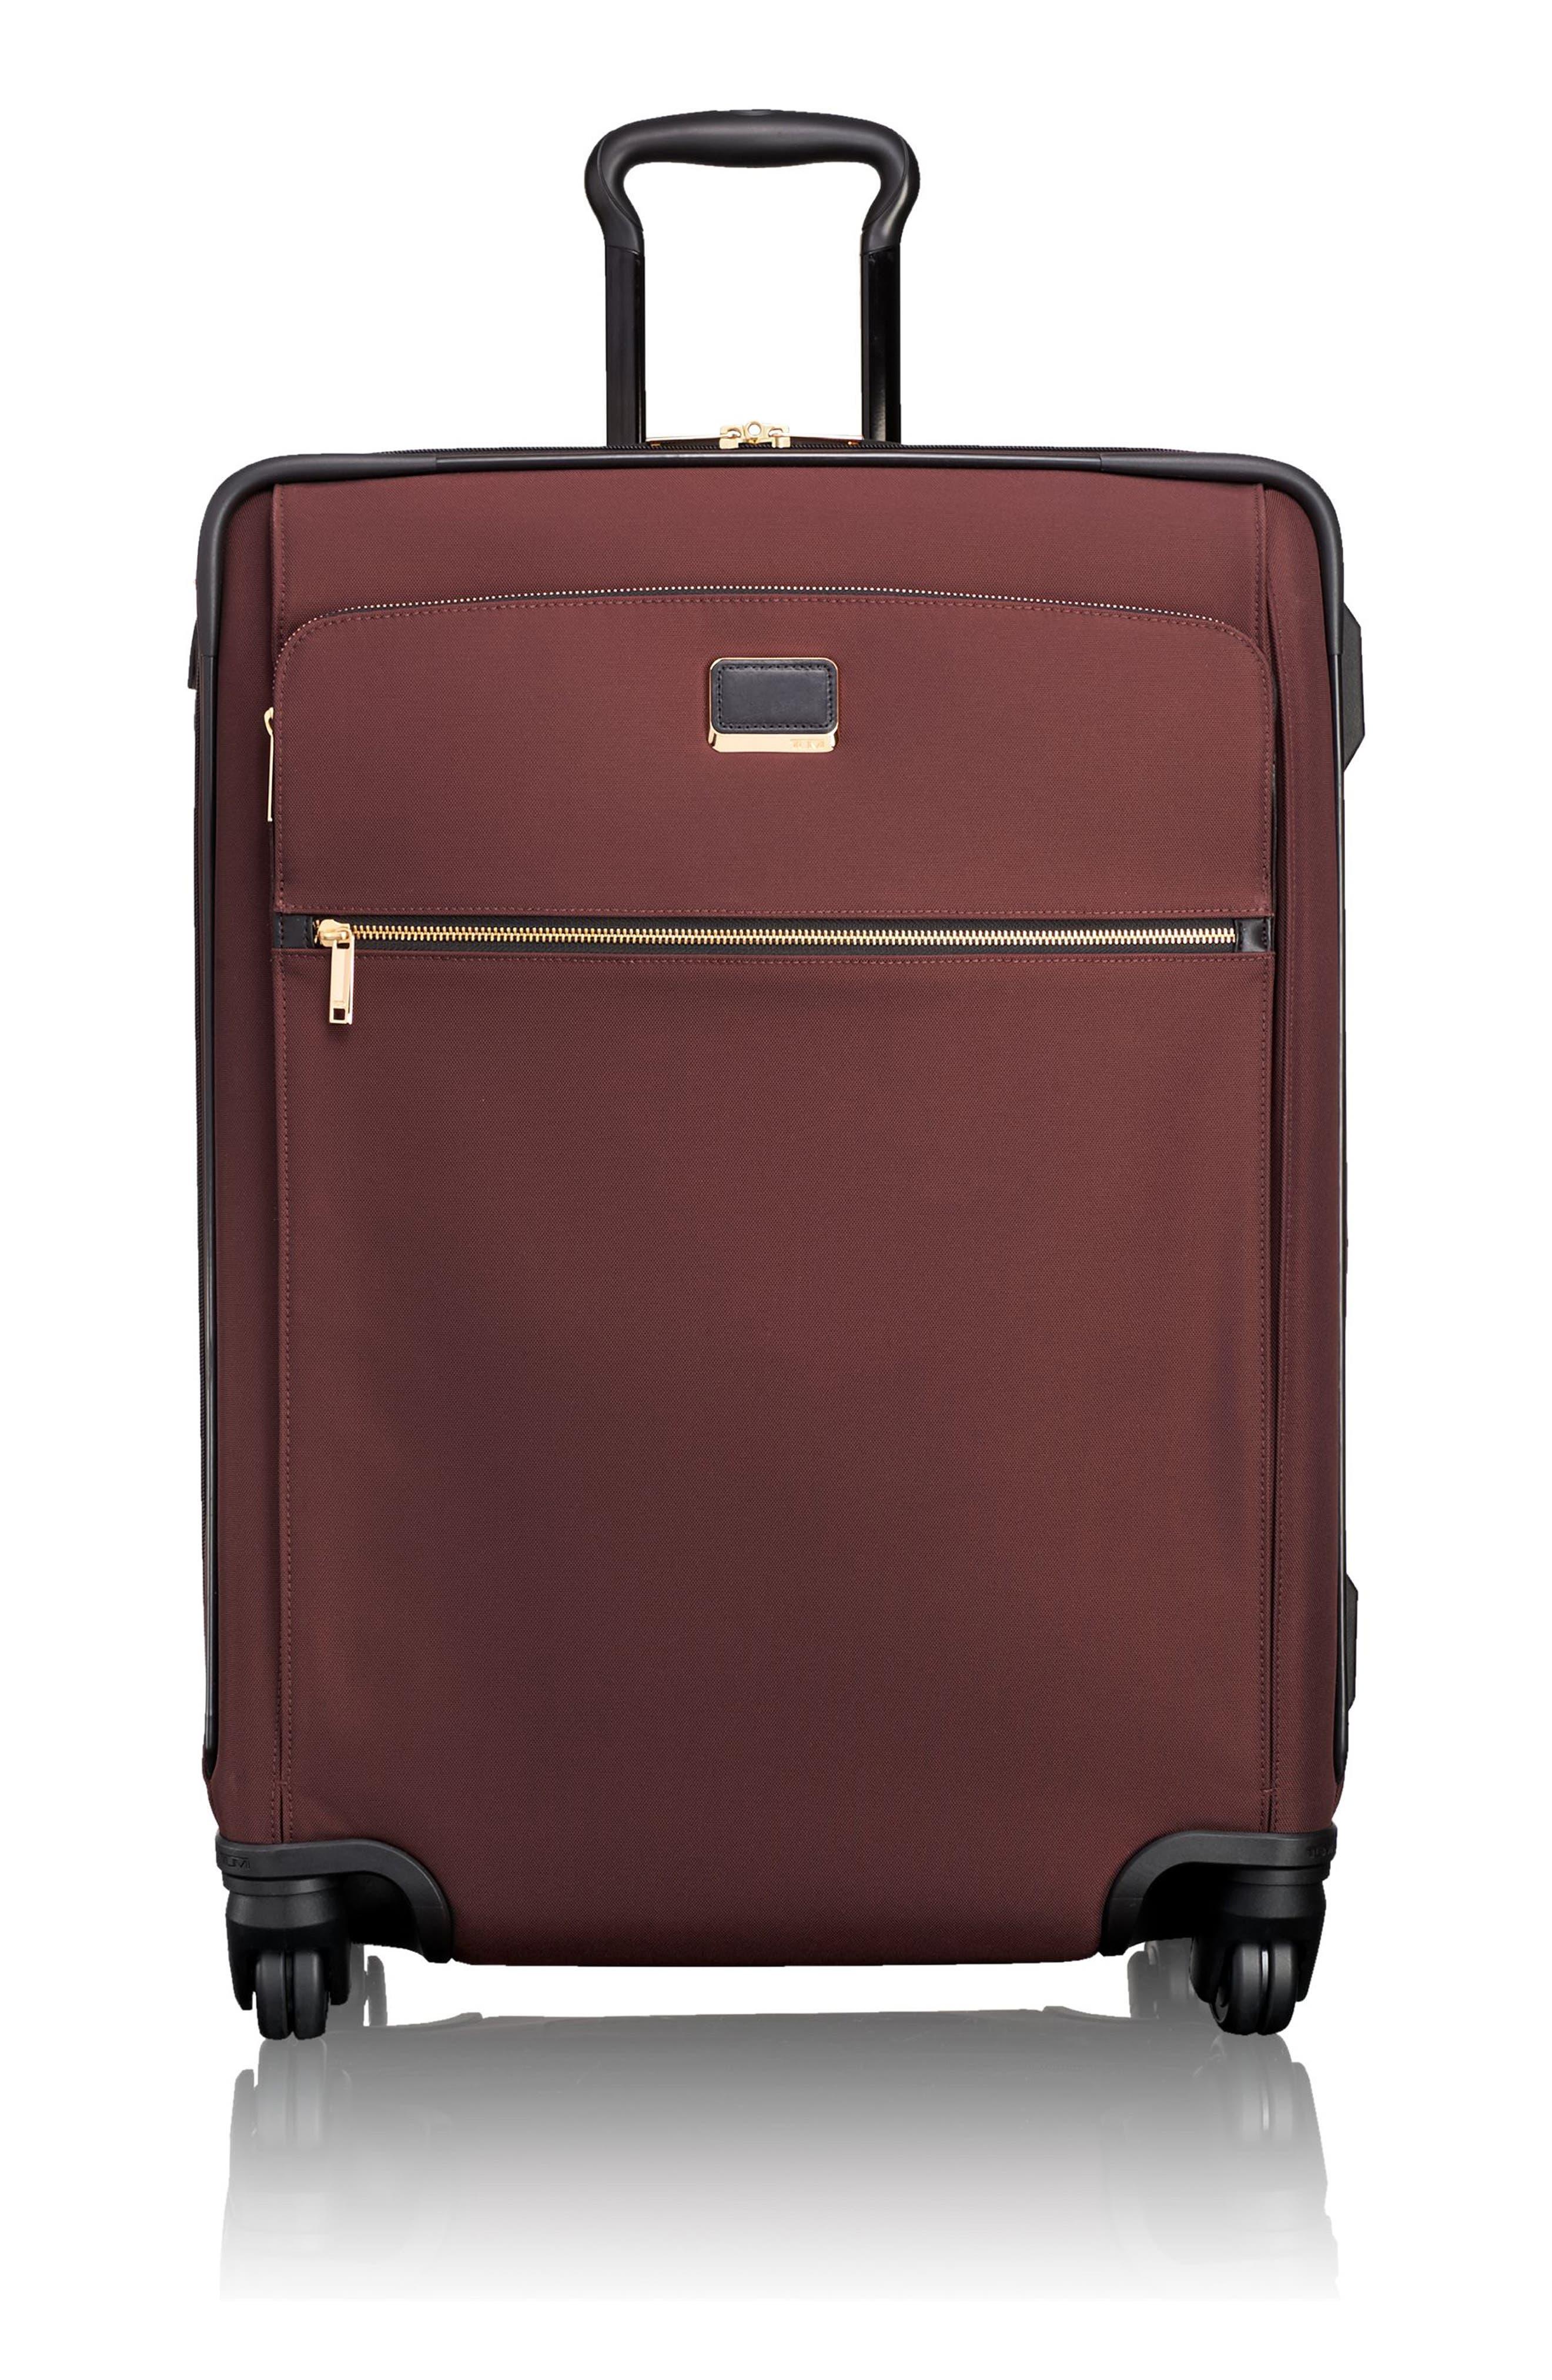 TUMI Jess Short Trip Expandable 26-Inch 4-Wheel Suitcase